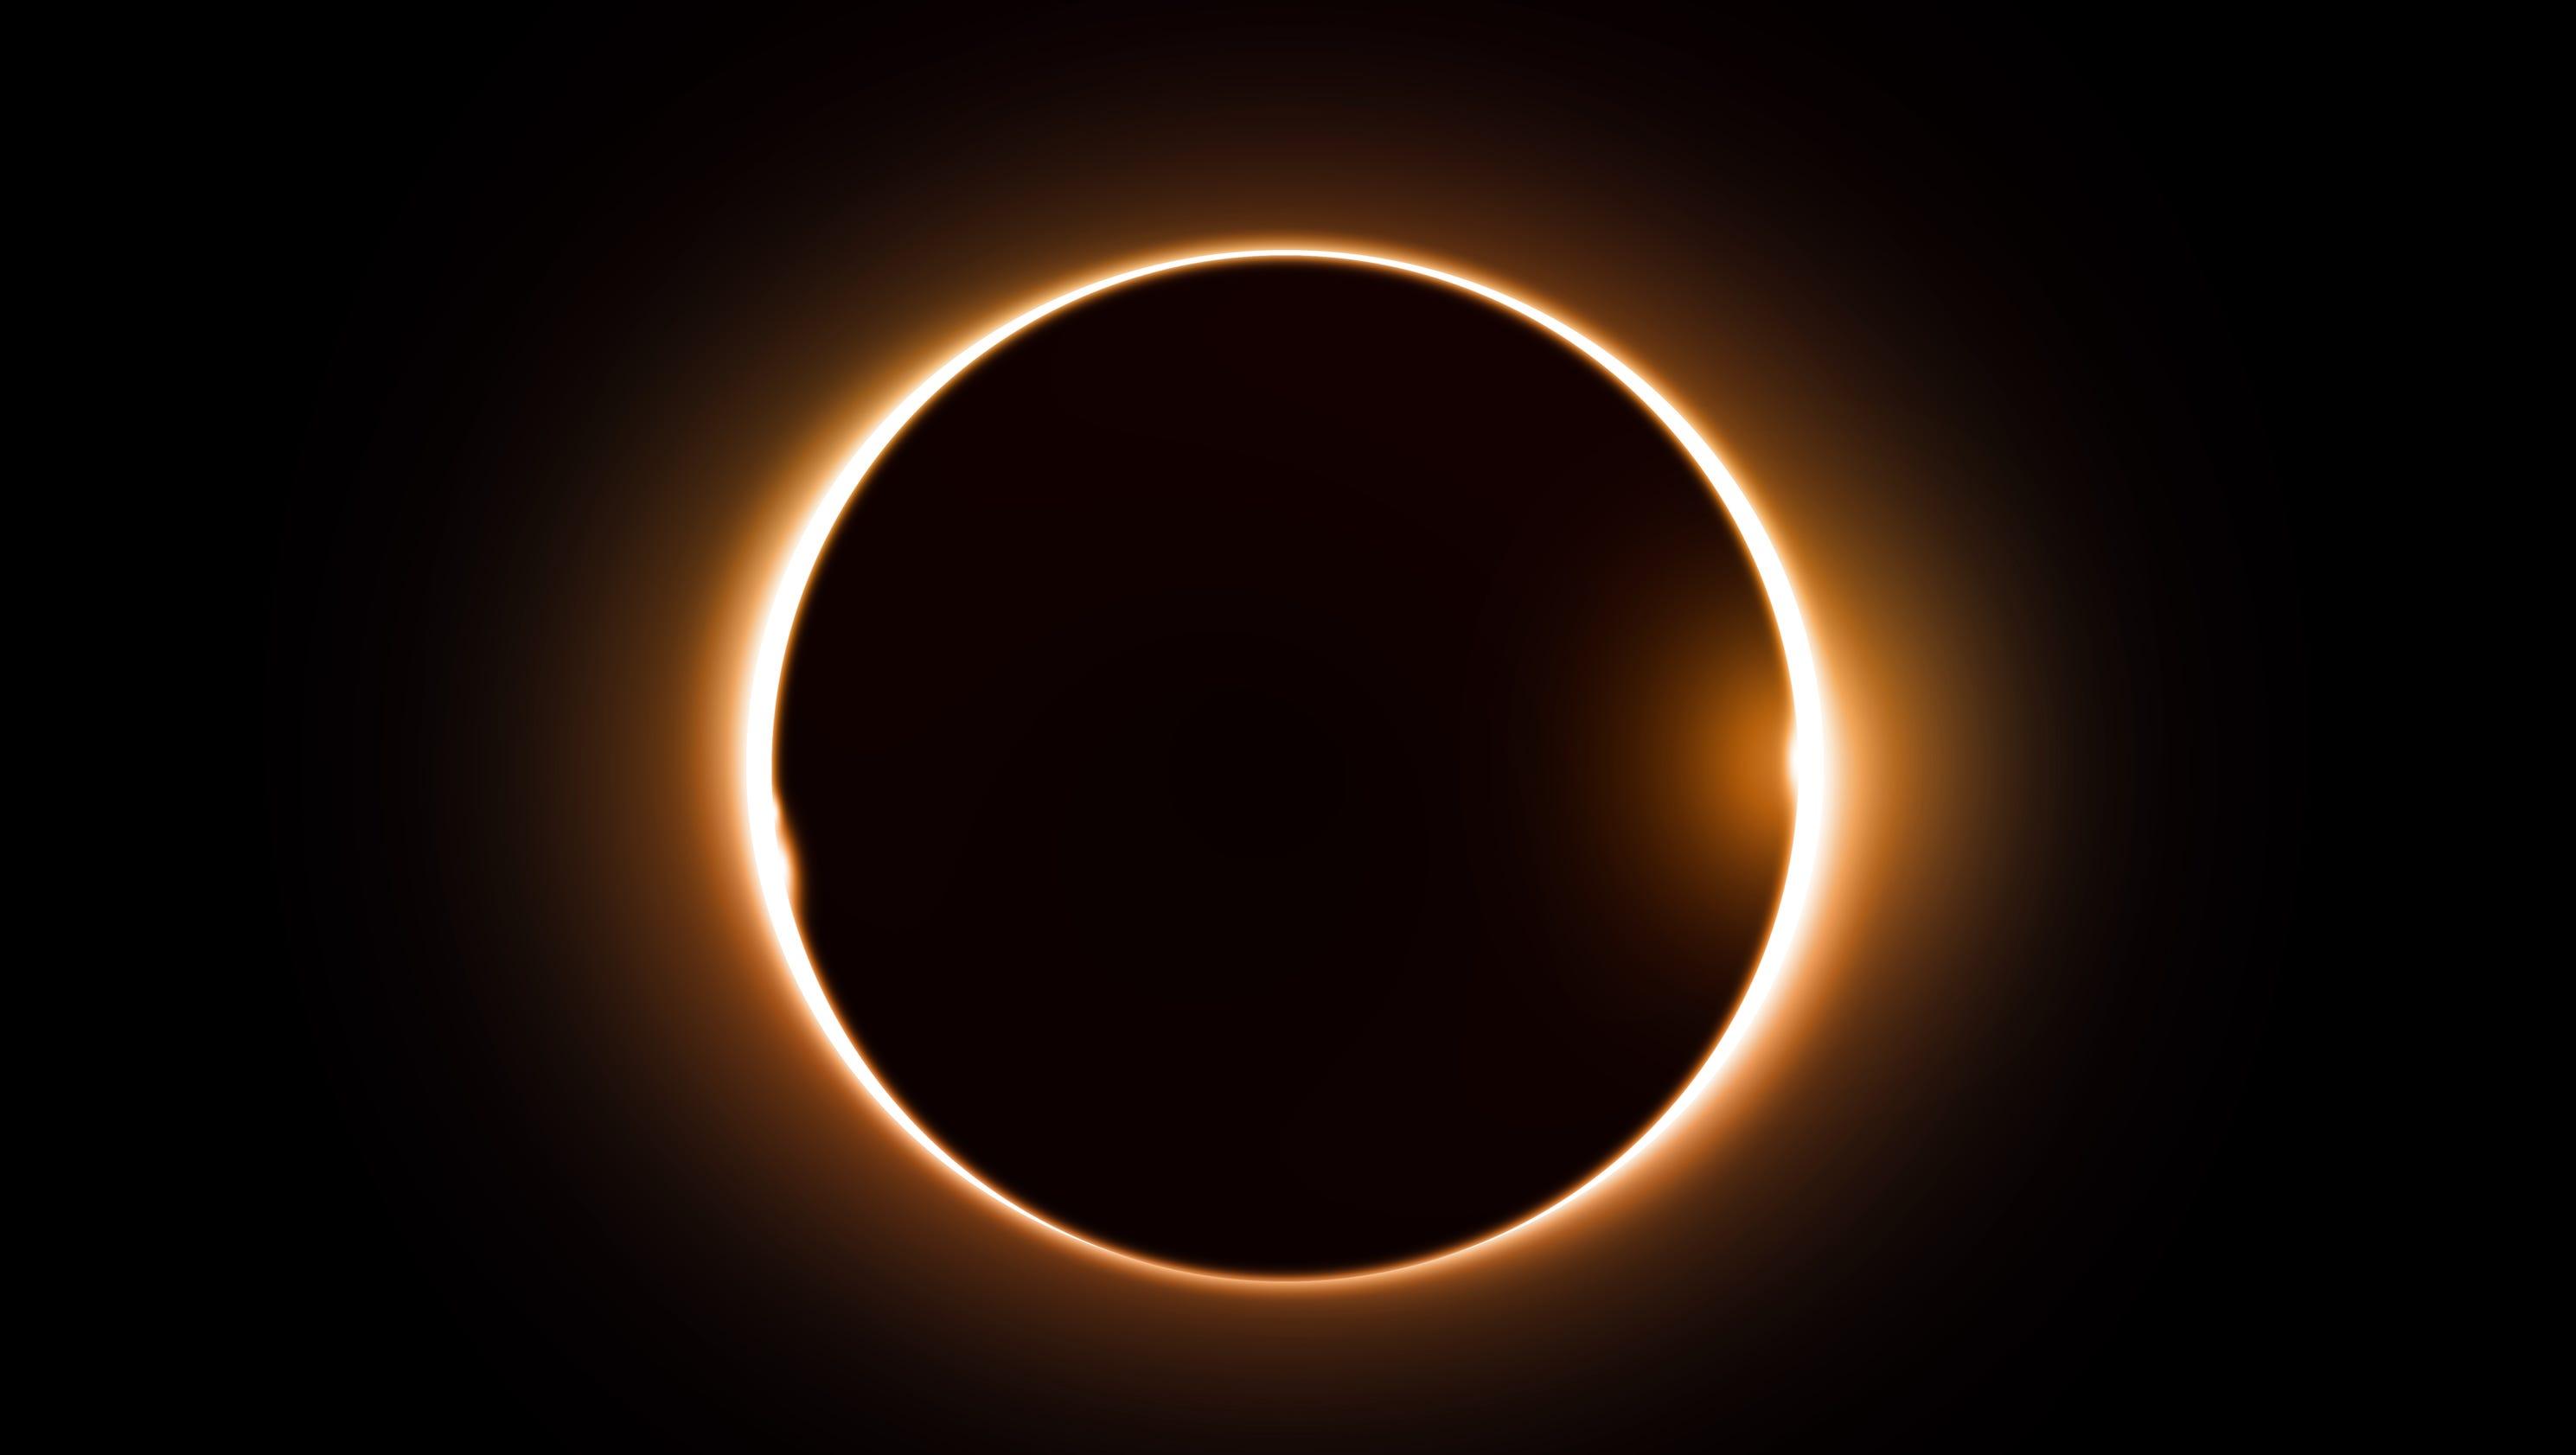 Salem officials prepared for Oregon solar eclipse